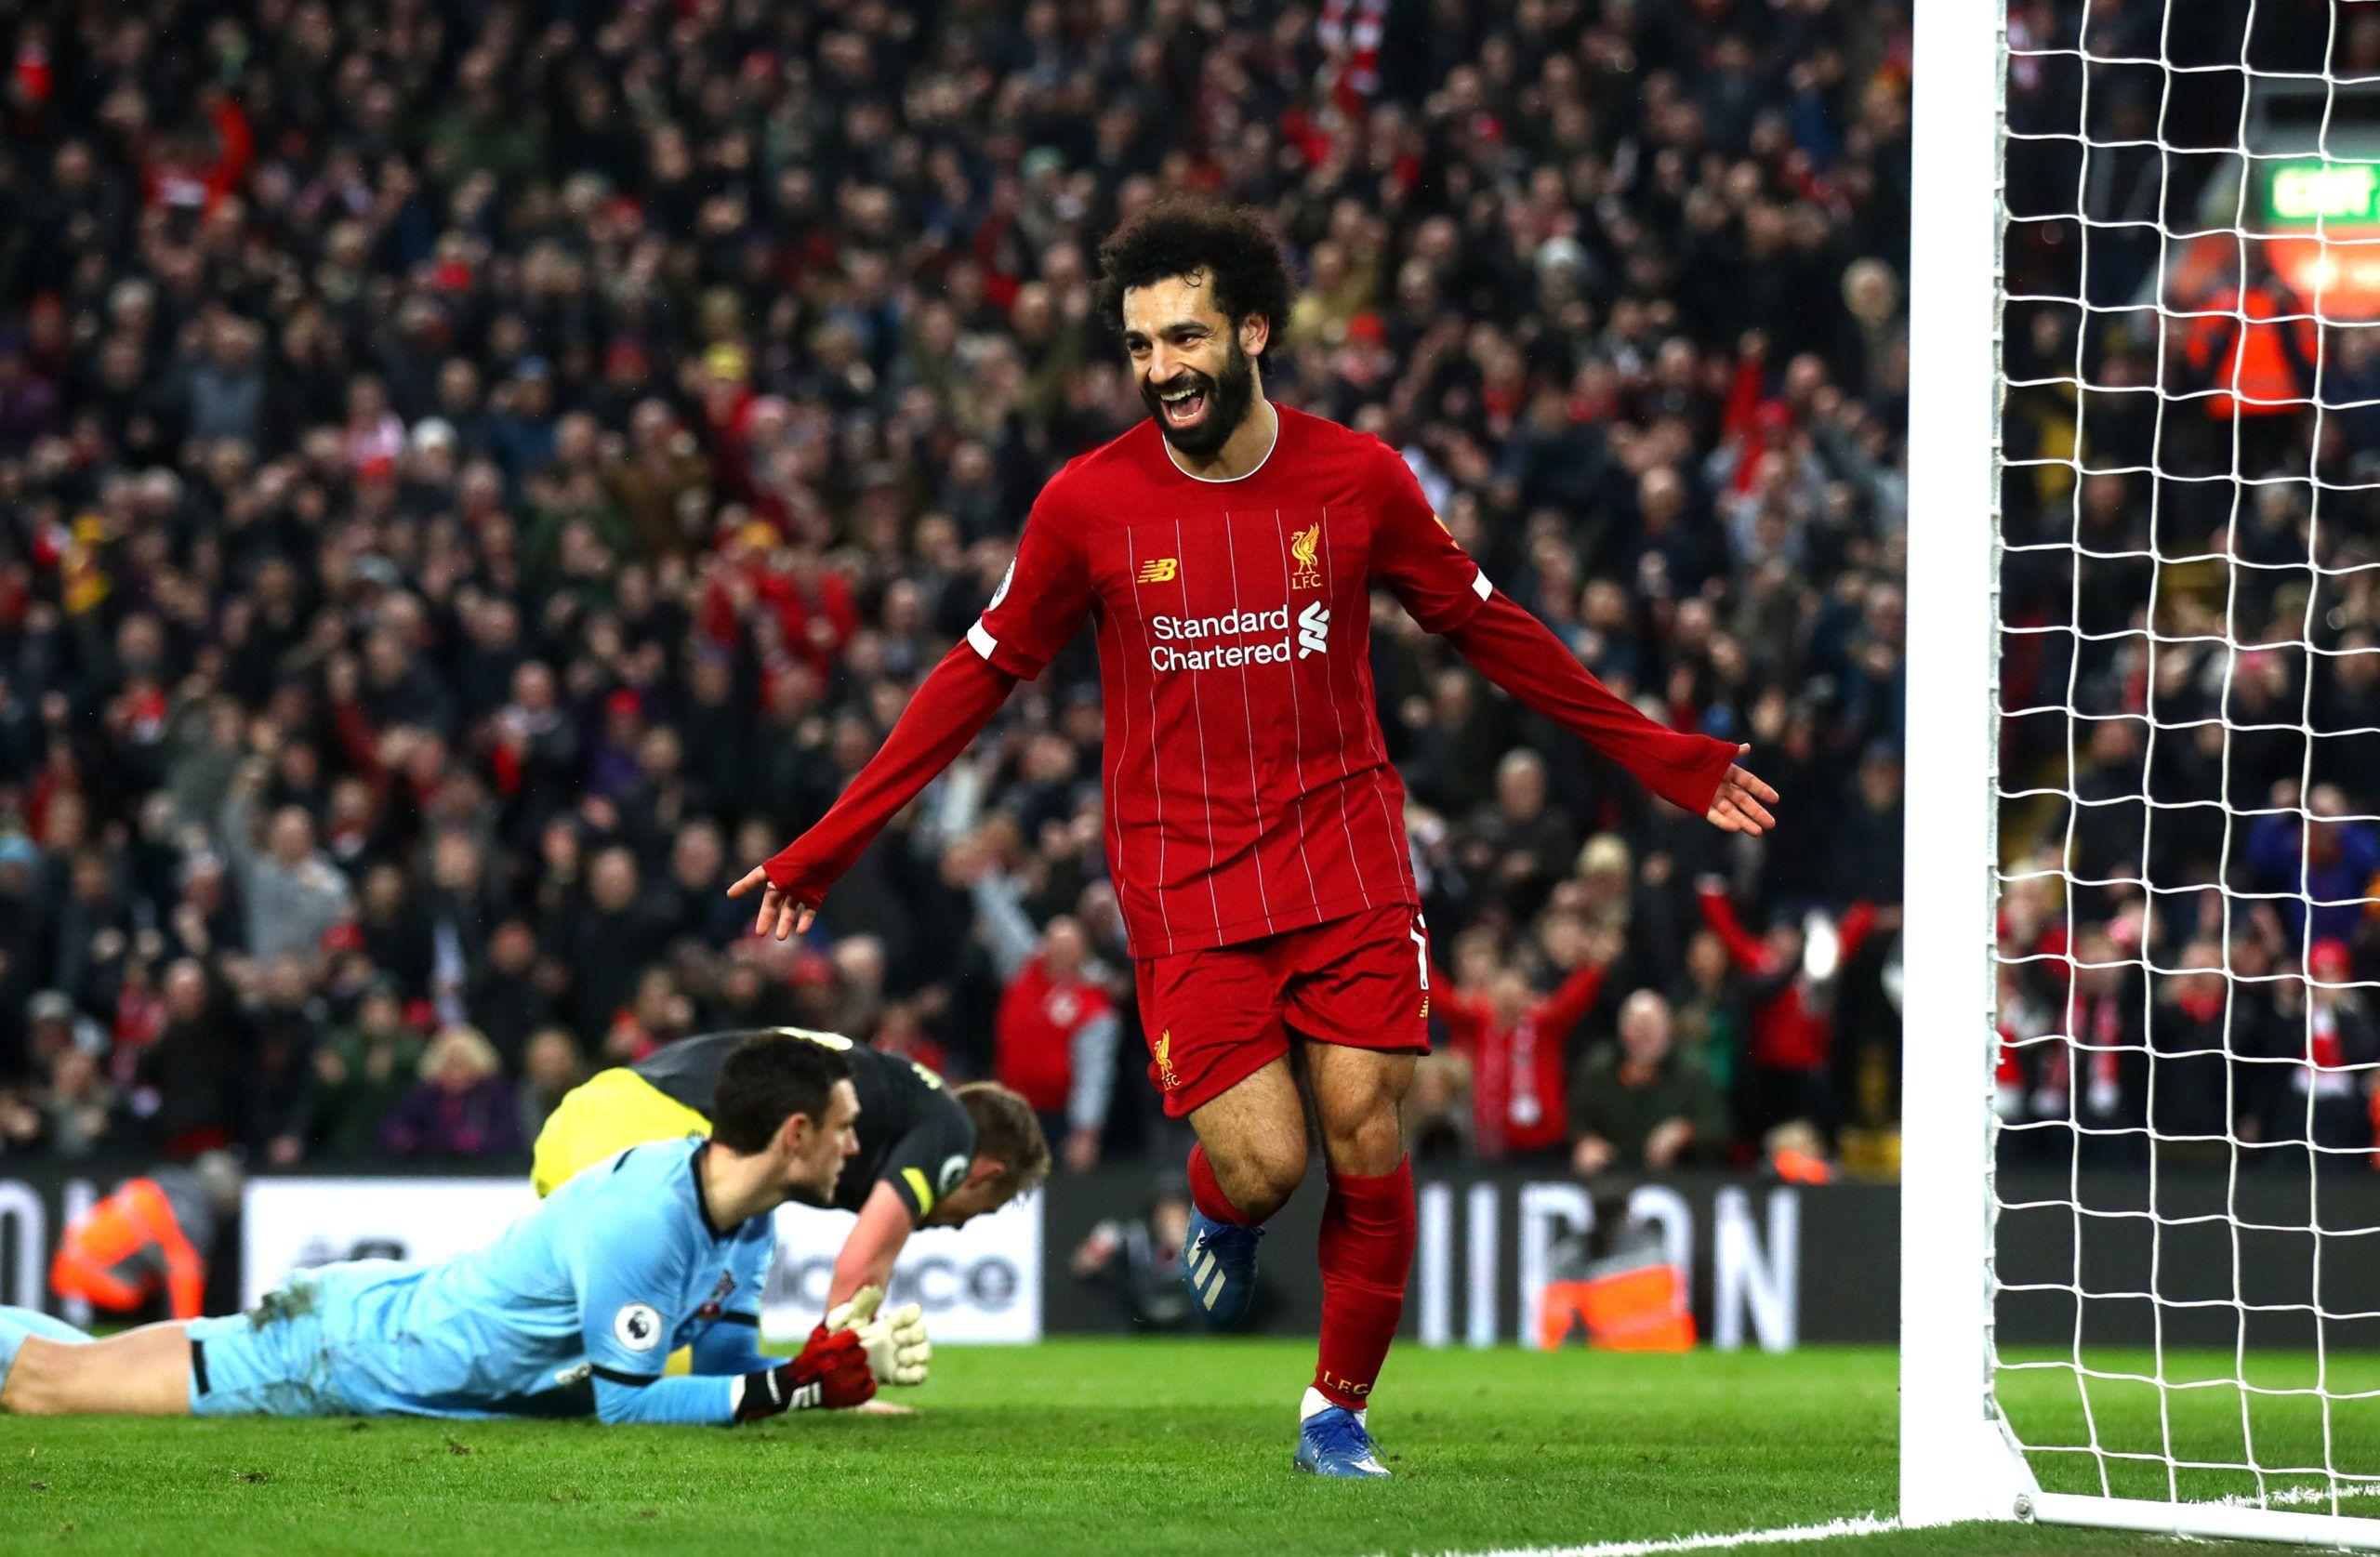 Liverpool Vs Southampton [4-0] Download Highlights. | Liverpool,  Southampton, Football match